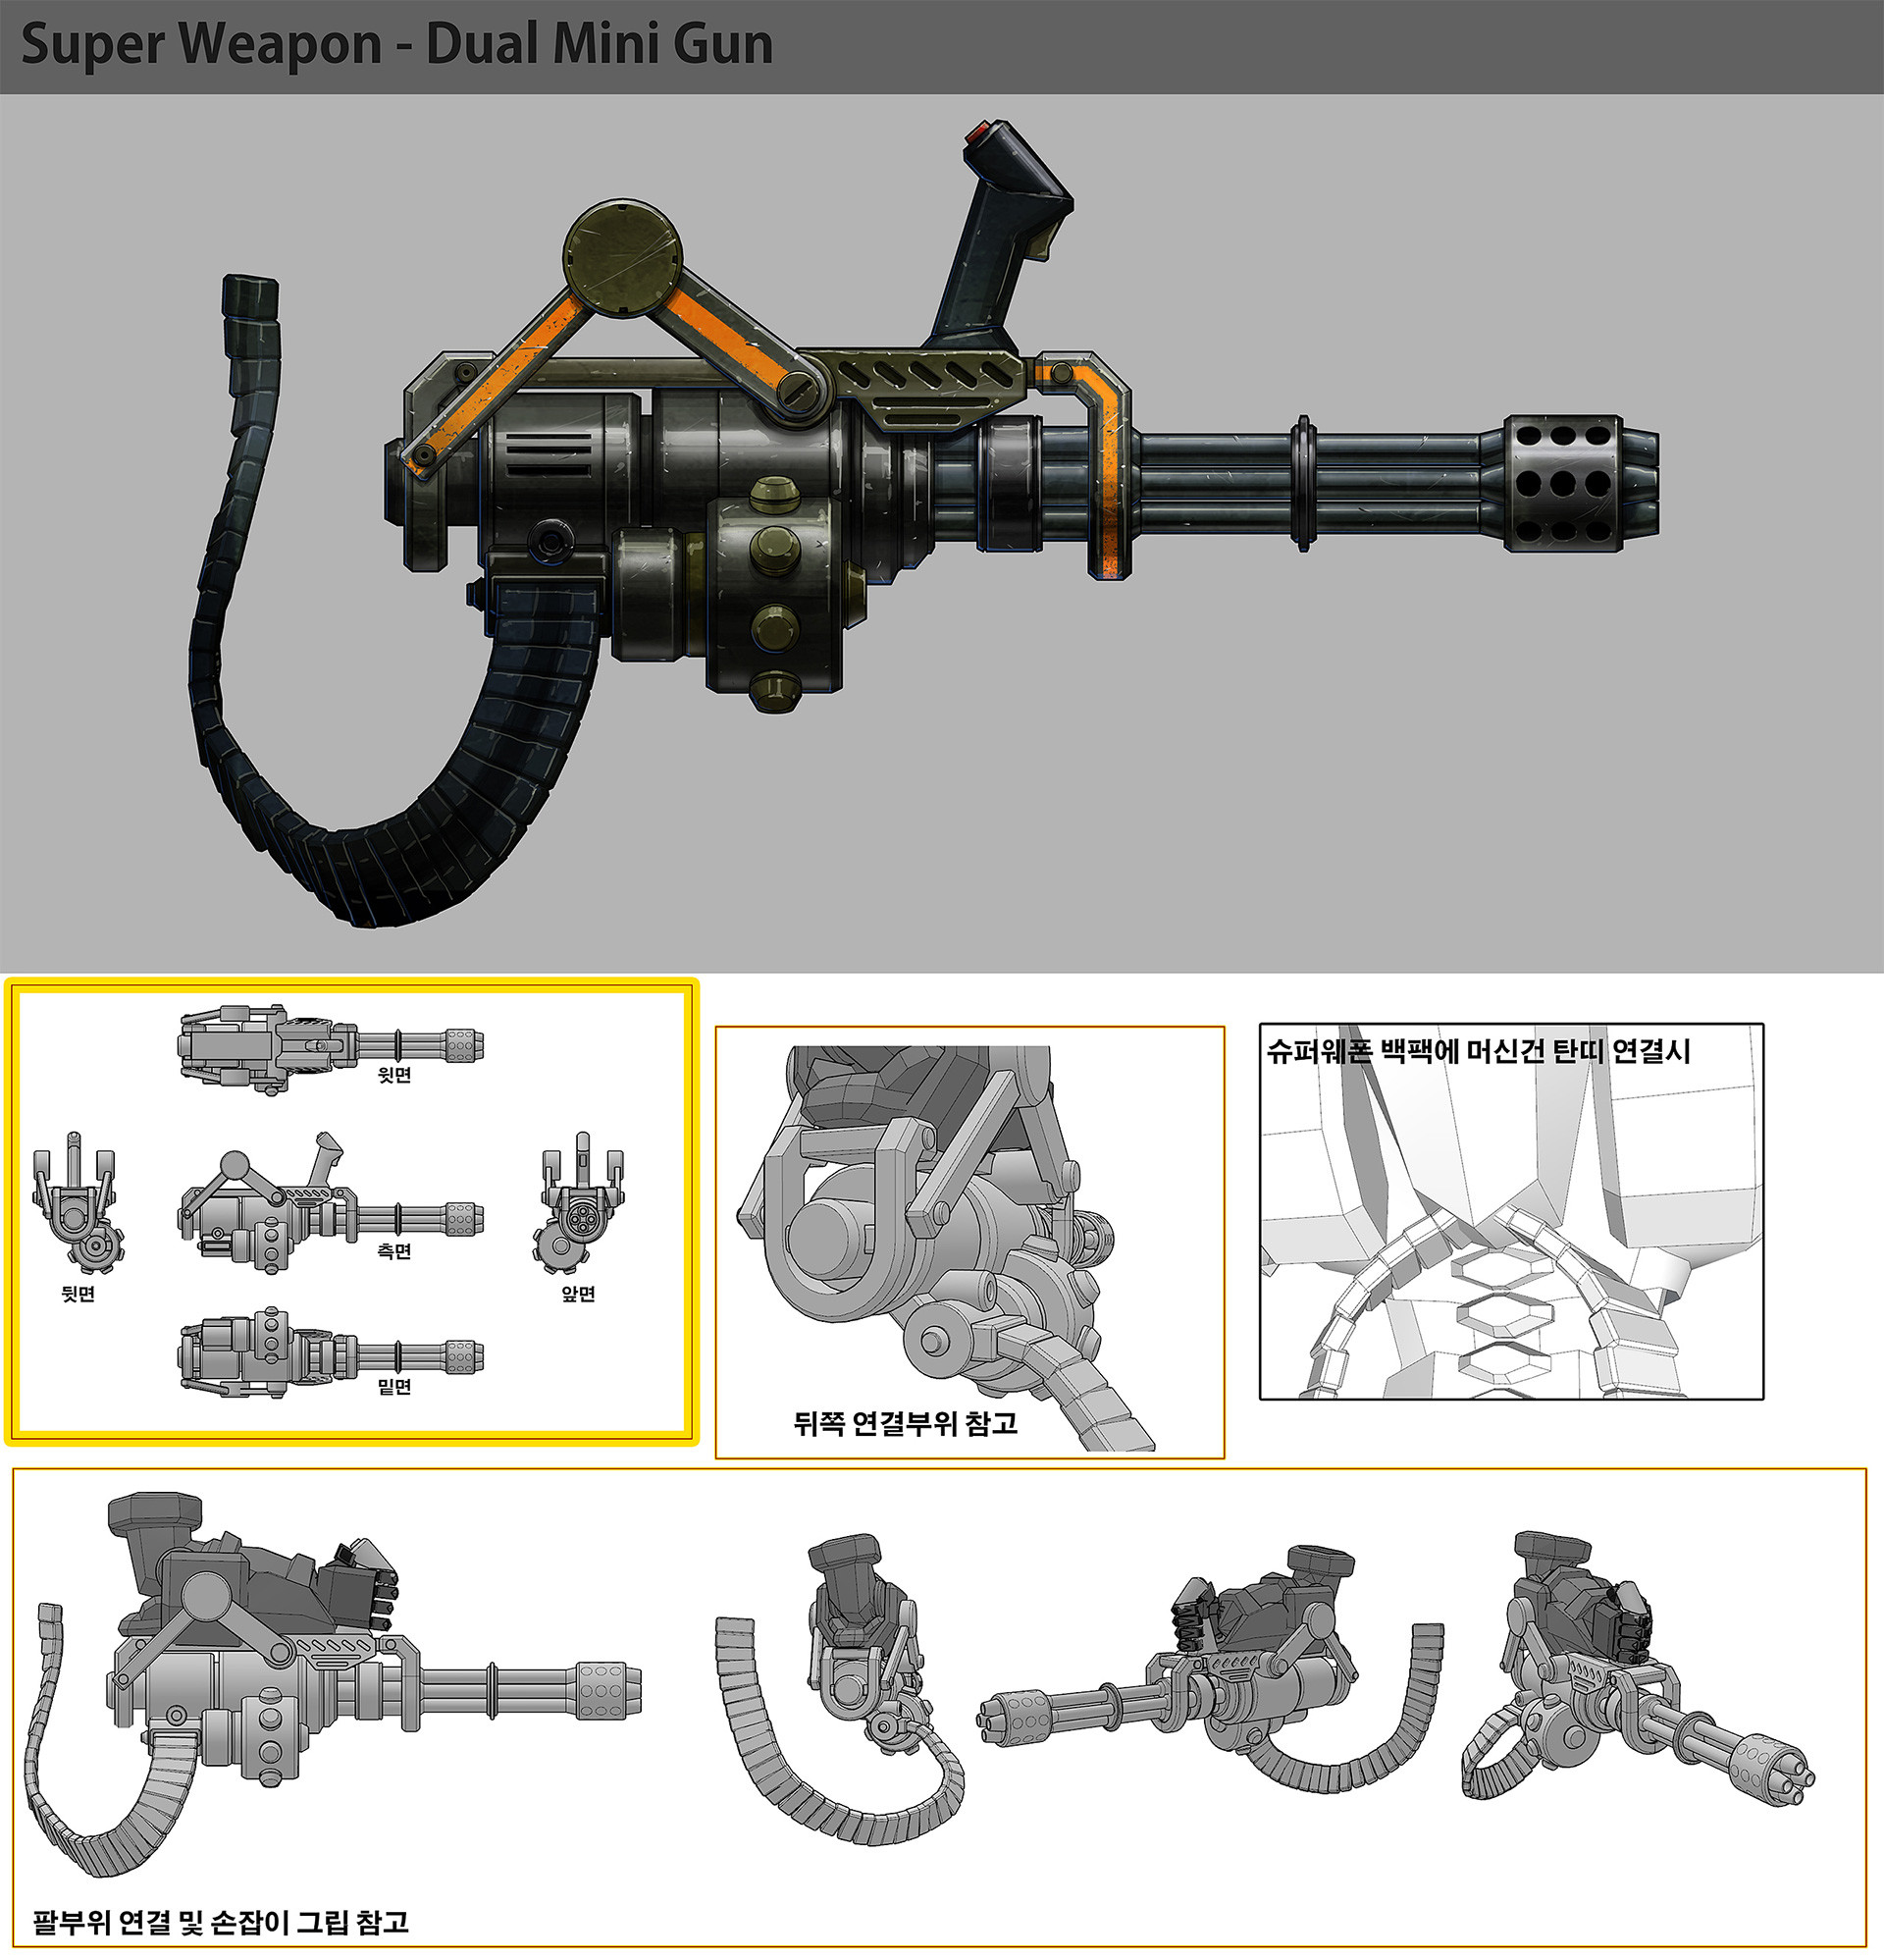 R o iaki superweapon dualminigun 01 2